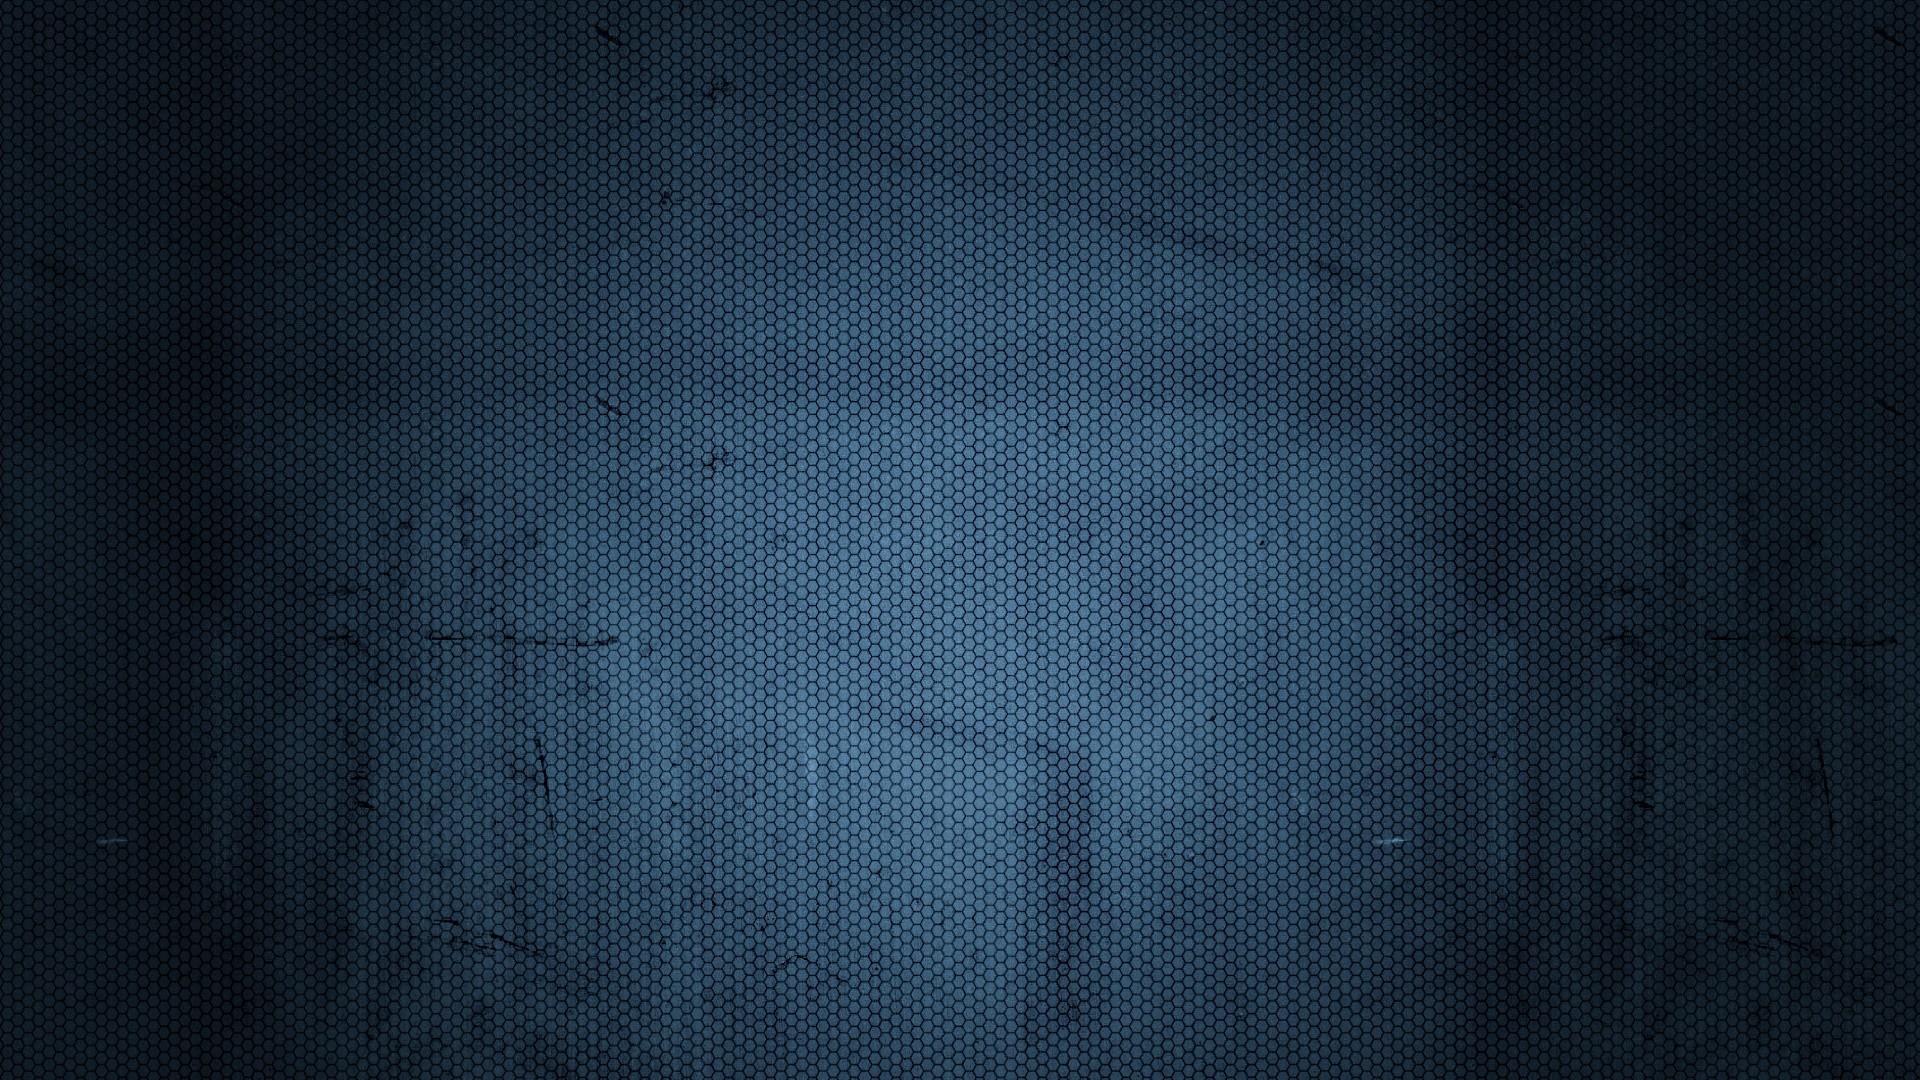 abstract wallpapers texture dark blue wallpaper desktop 1920x1080